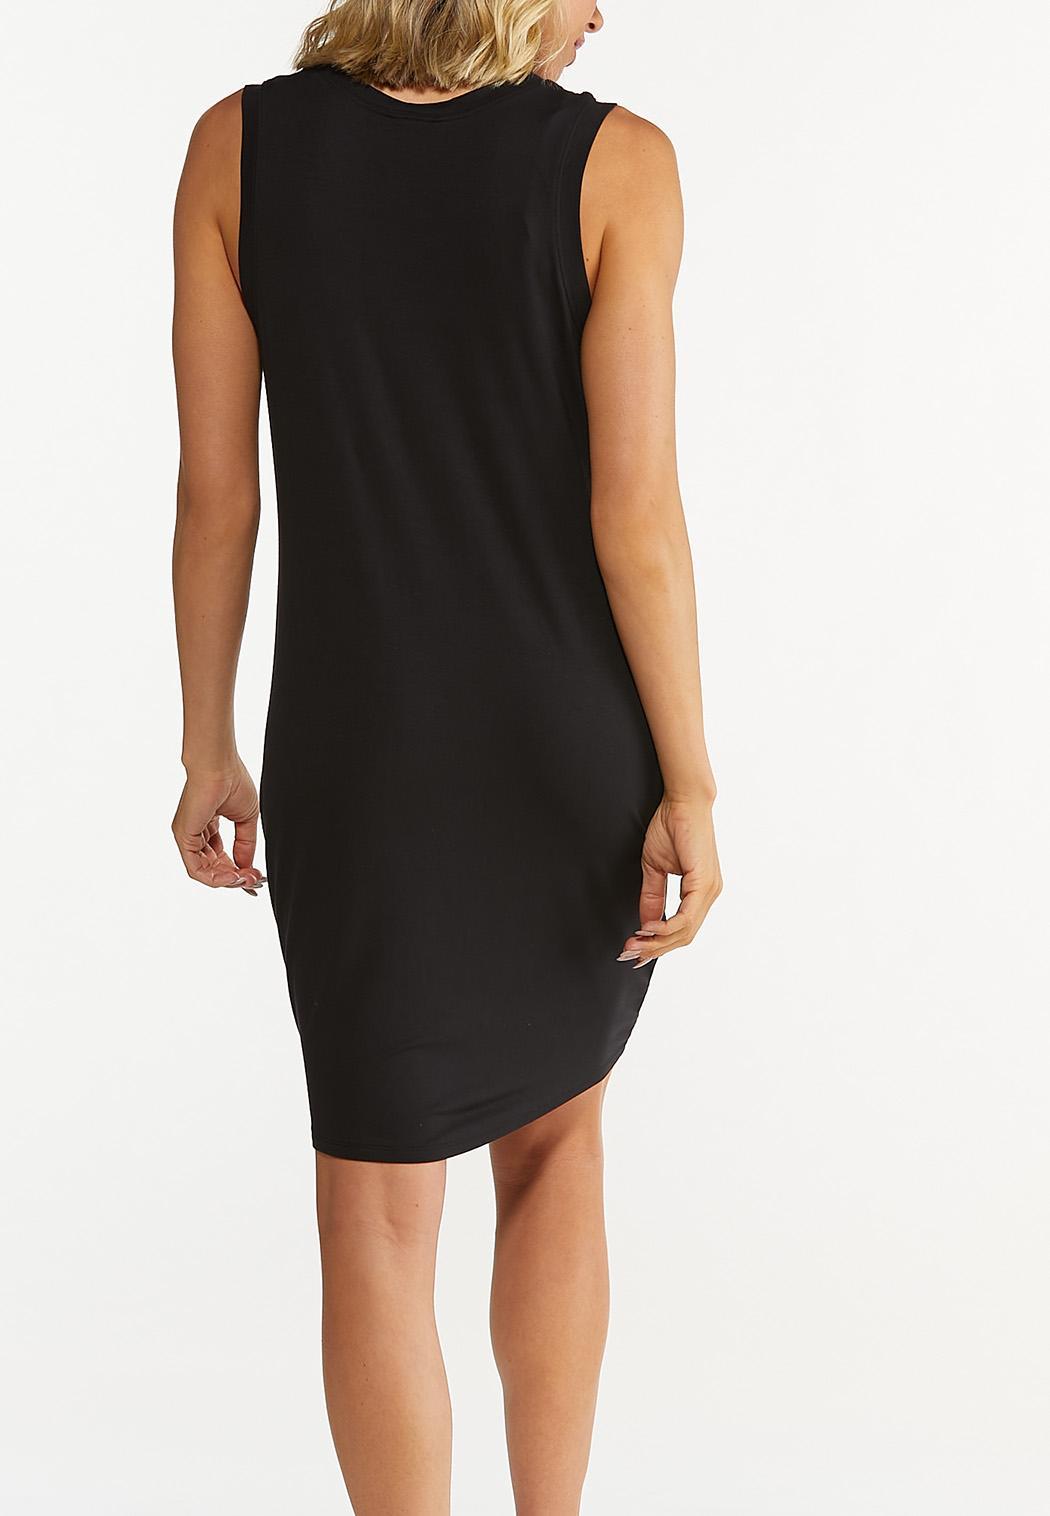 Plus Size Black Tank Dress (Item #44608581)